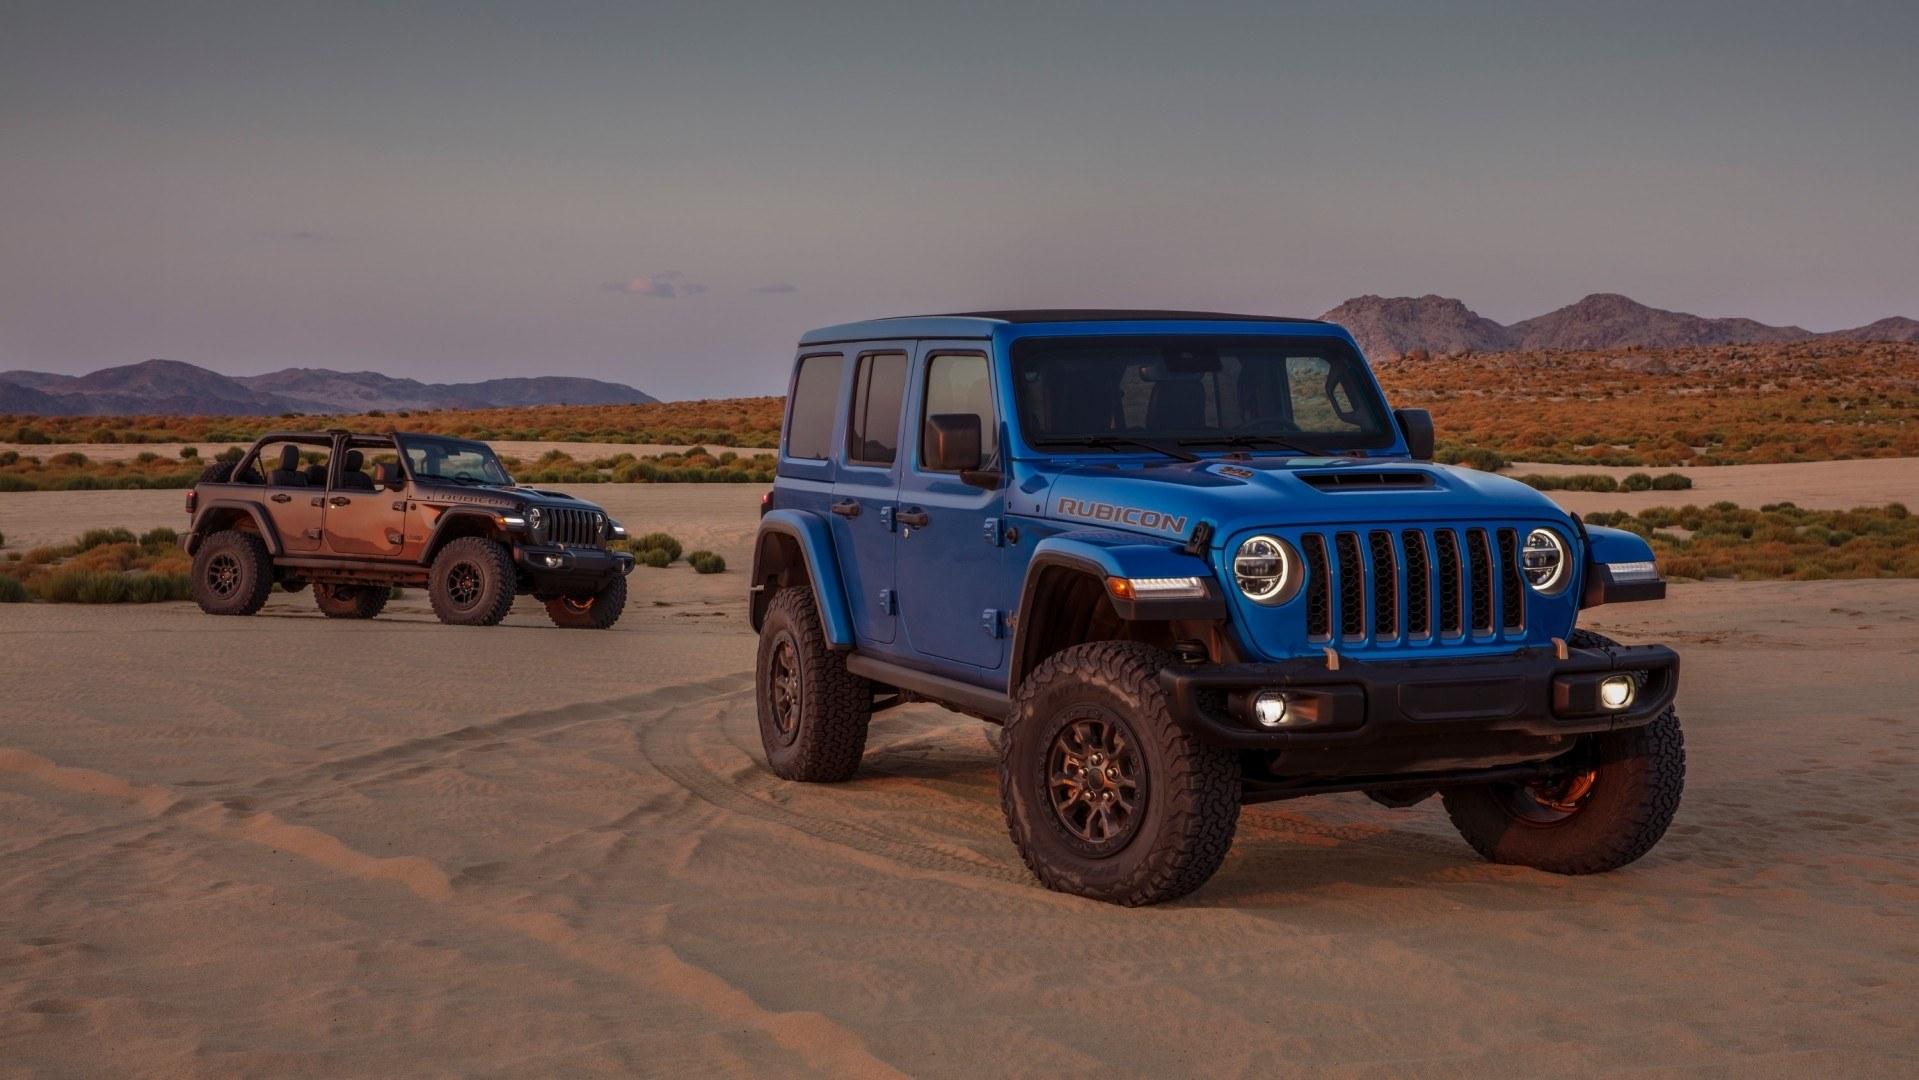 2021 Jeep Wrangler Rubicon 392, por fin llega el motor V8